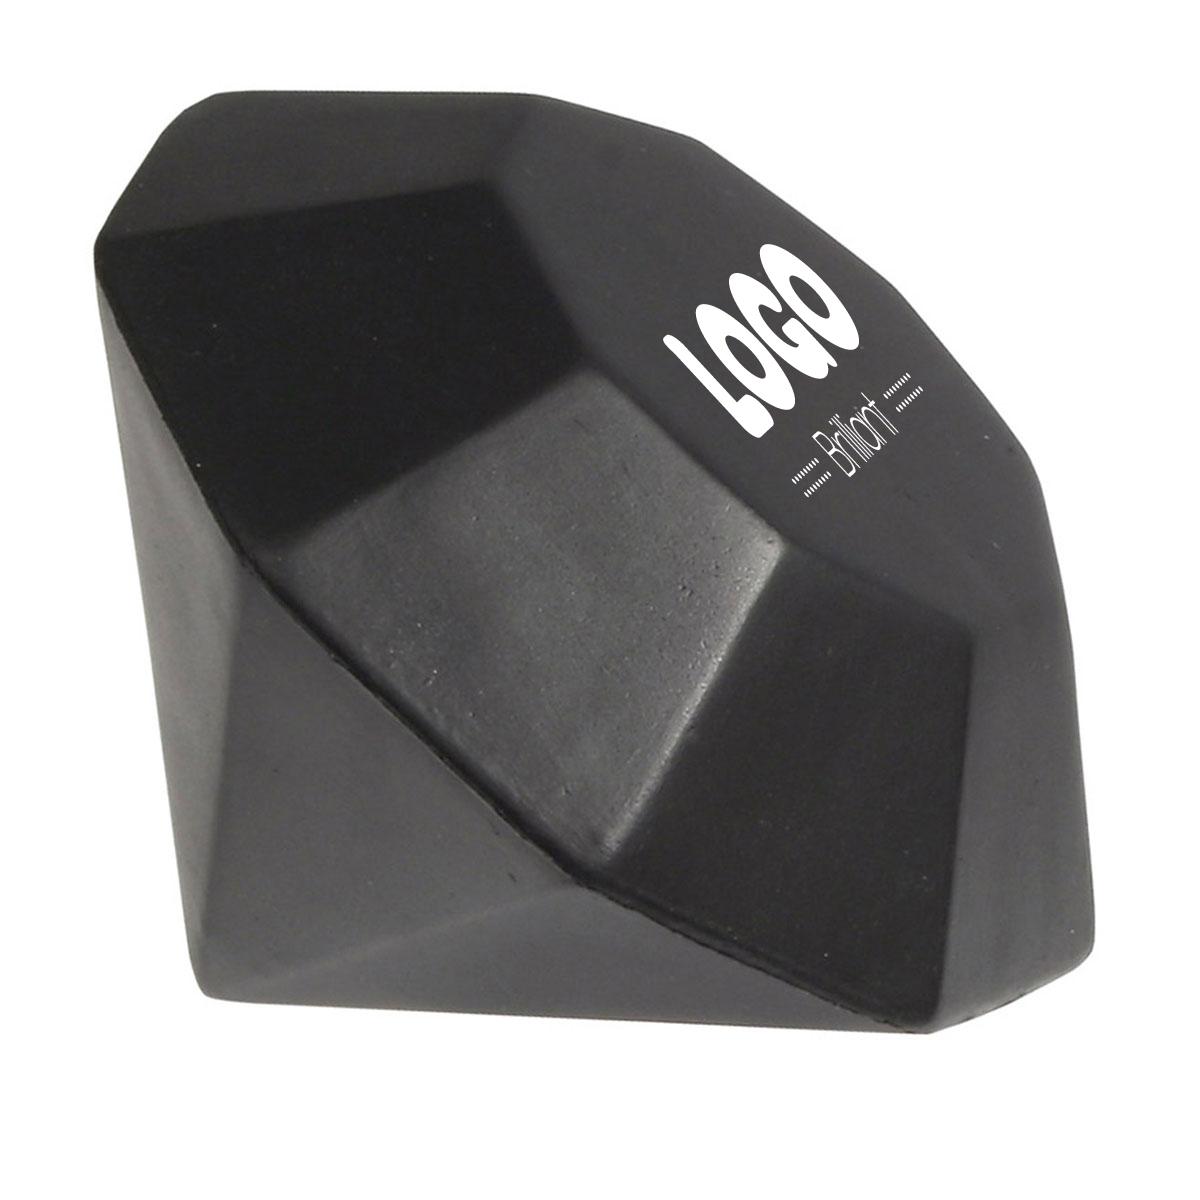 134886 diamond stress reliever one color imprint